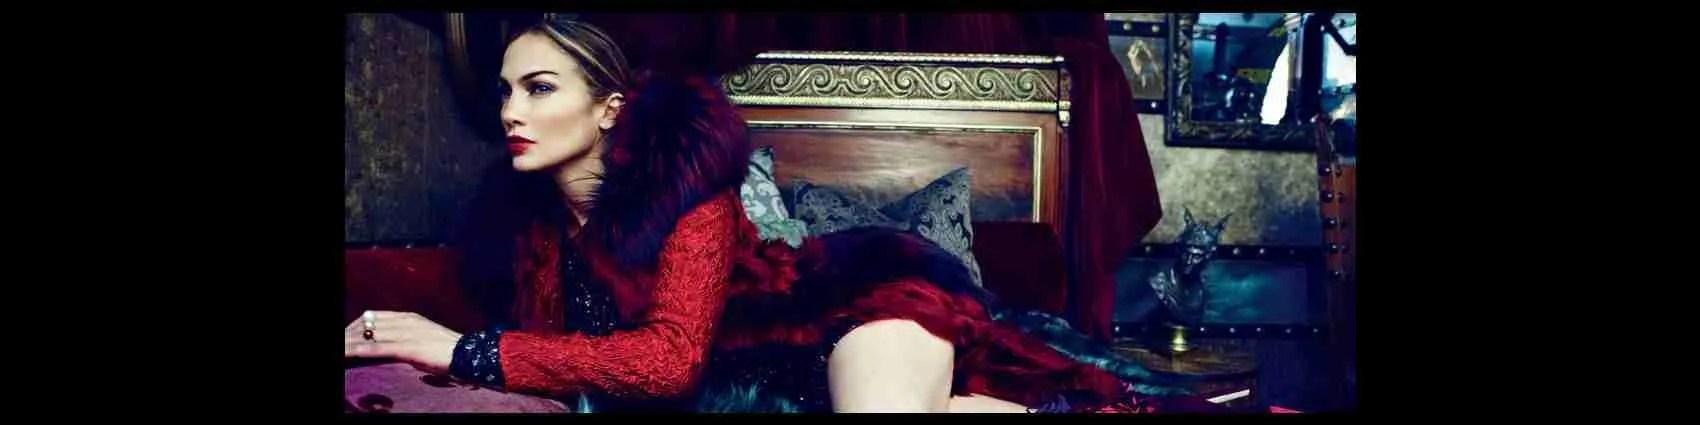 Jennifer Lopez. Magica Escort